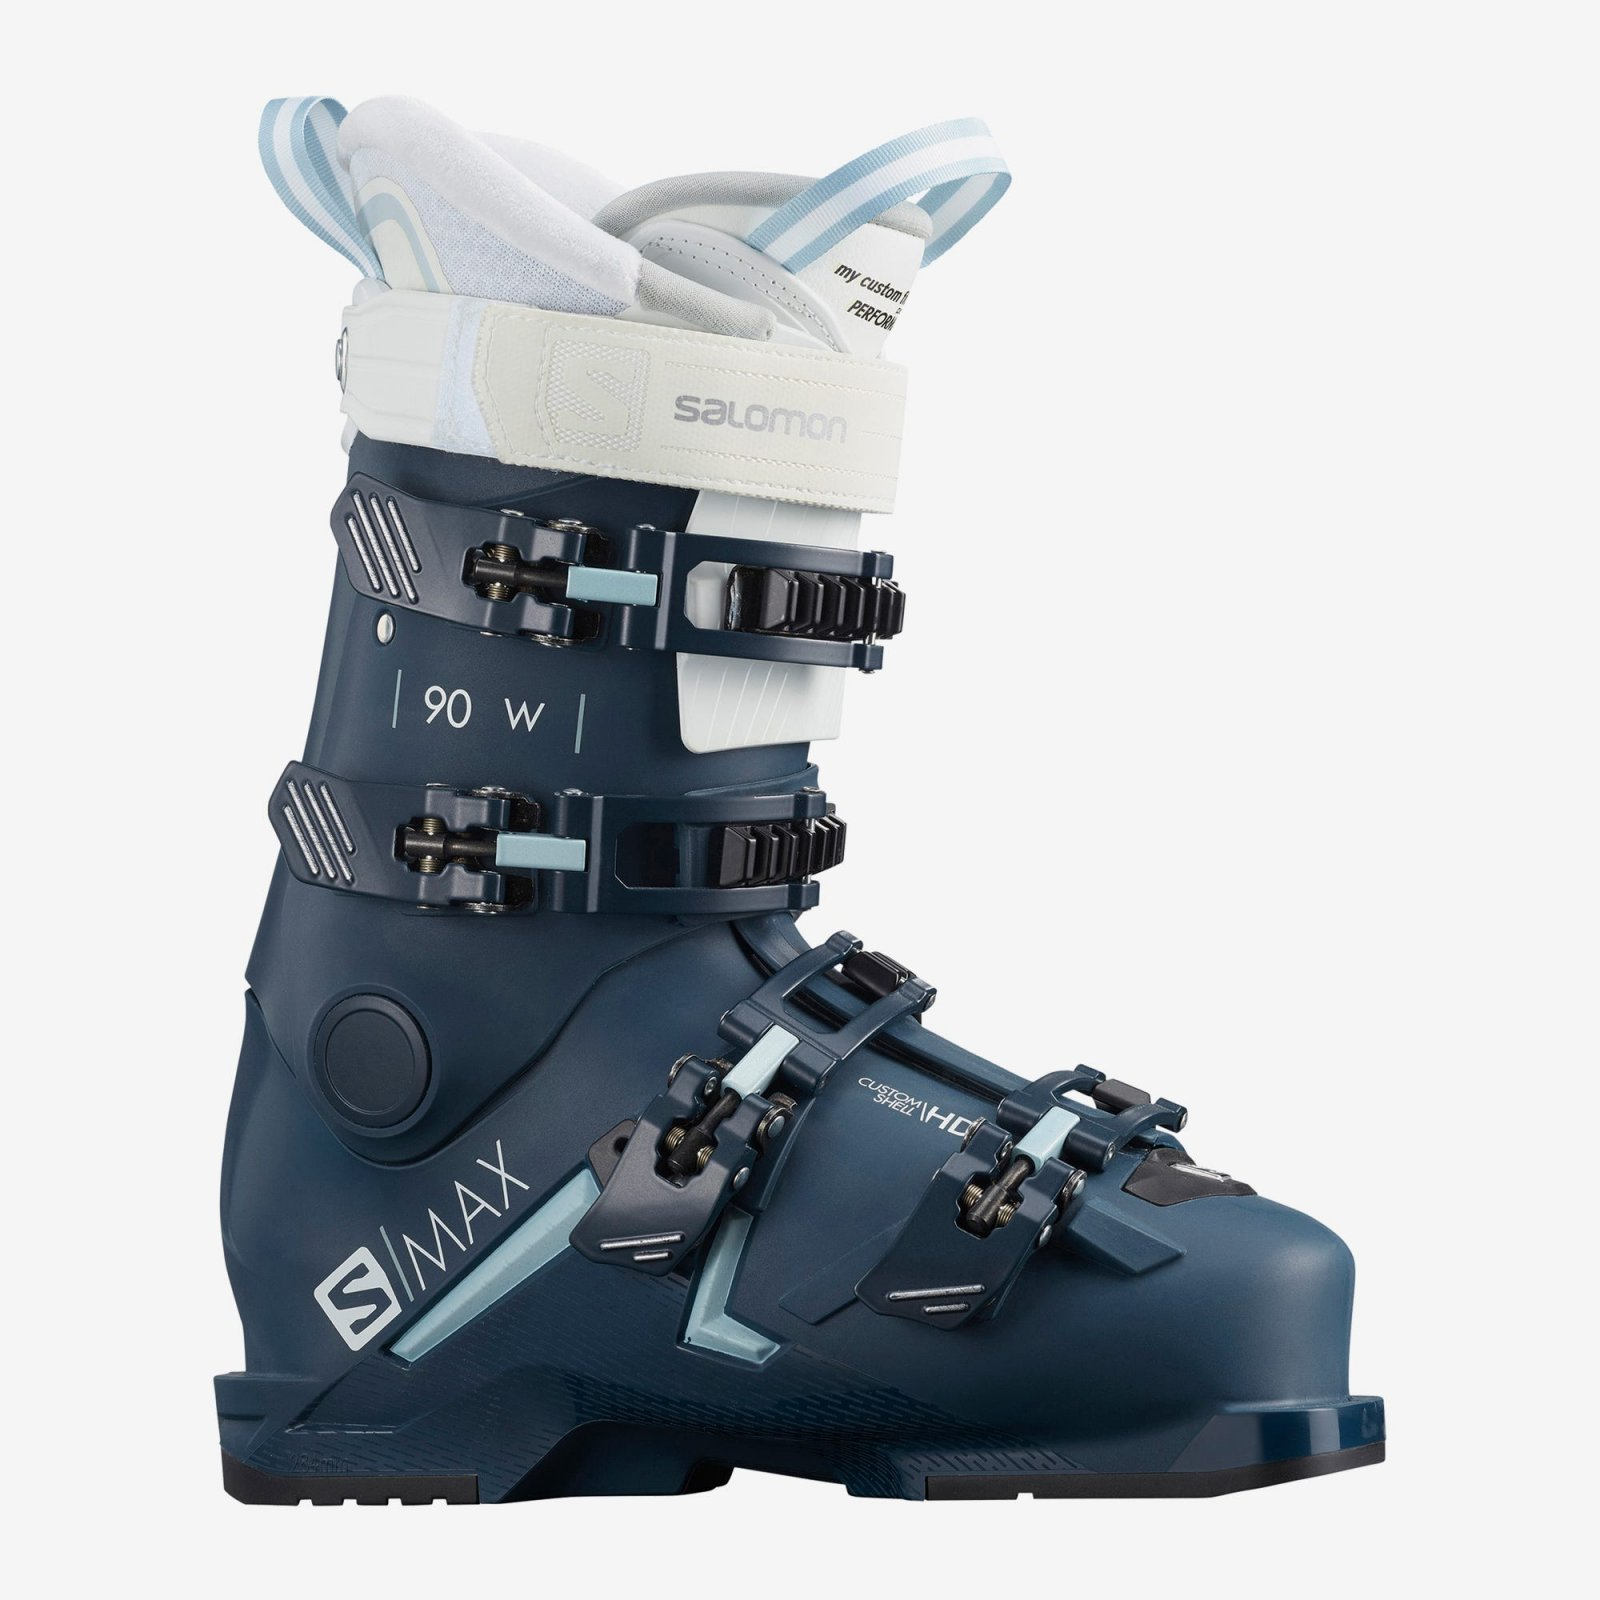 Salomon S/MAX 90 Women's Ski Boots - Petrol Blue/Sterling Blue/White